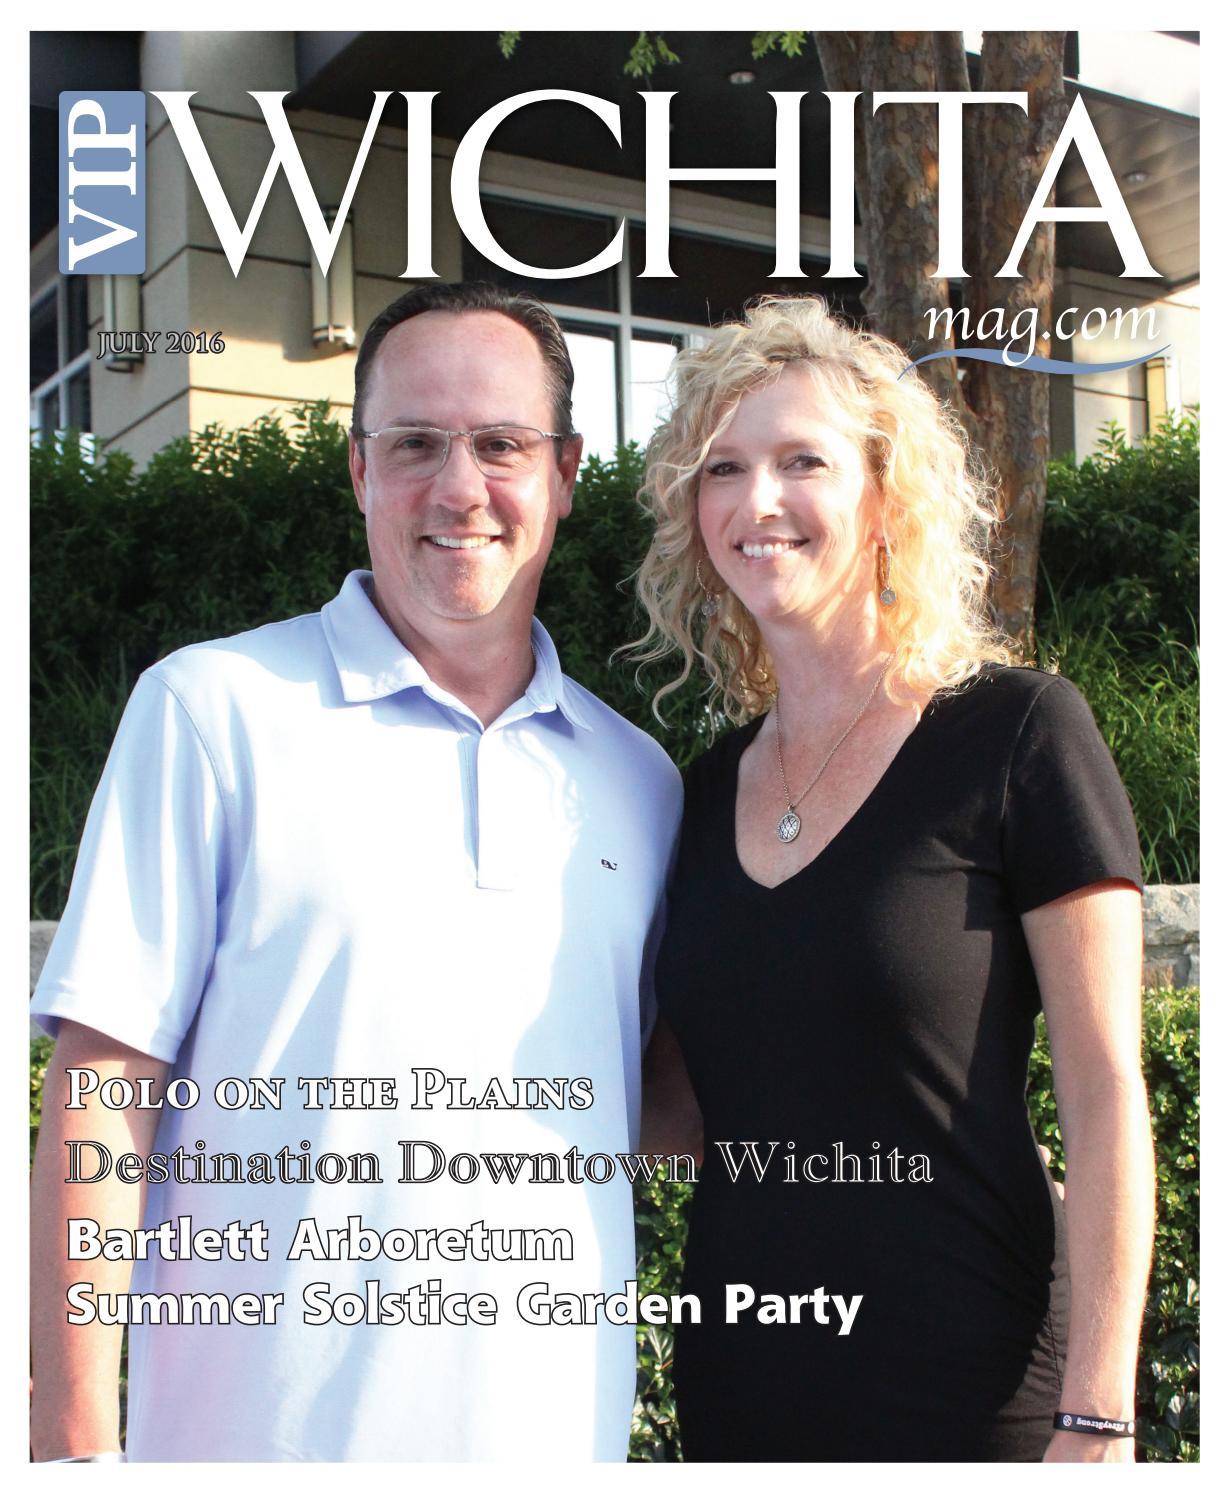 Vip Wichita Magazine July 2016 By Vip Wichita Magazine